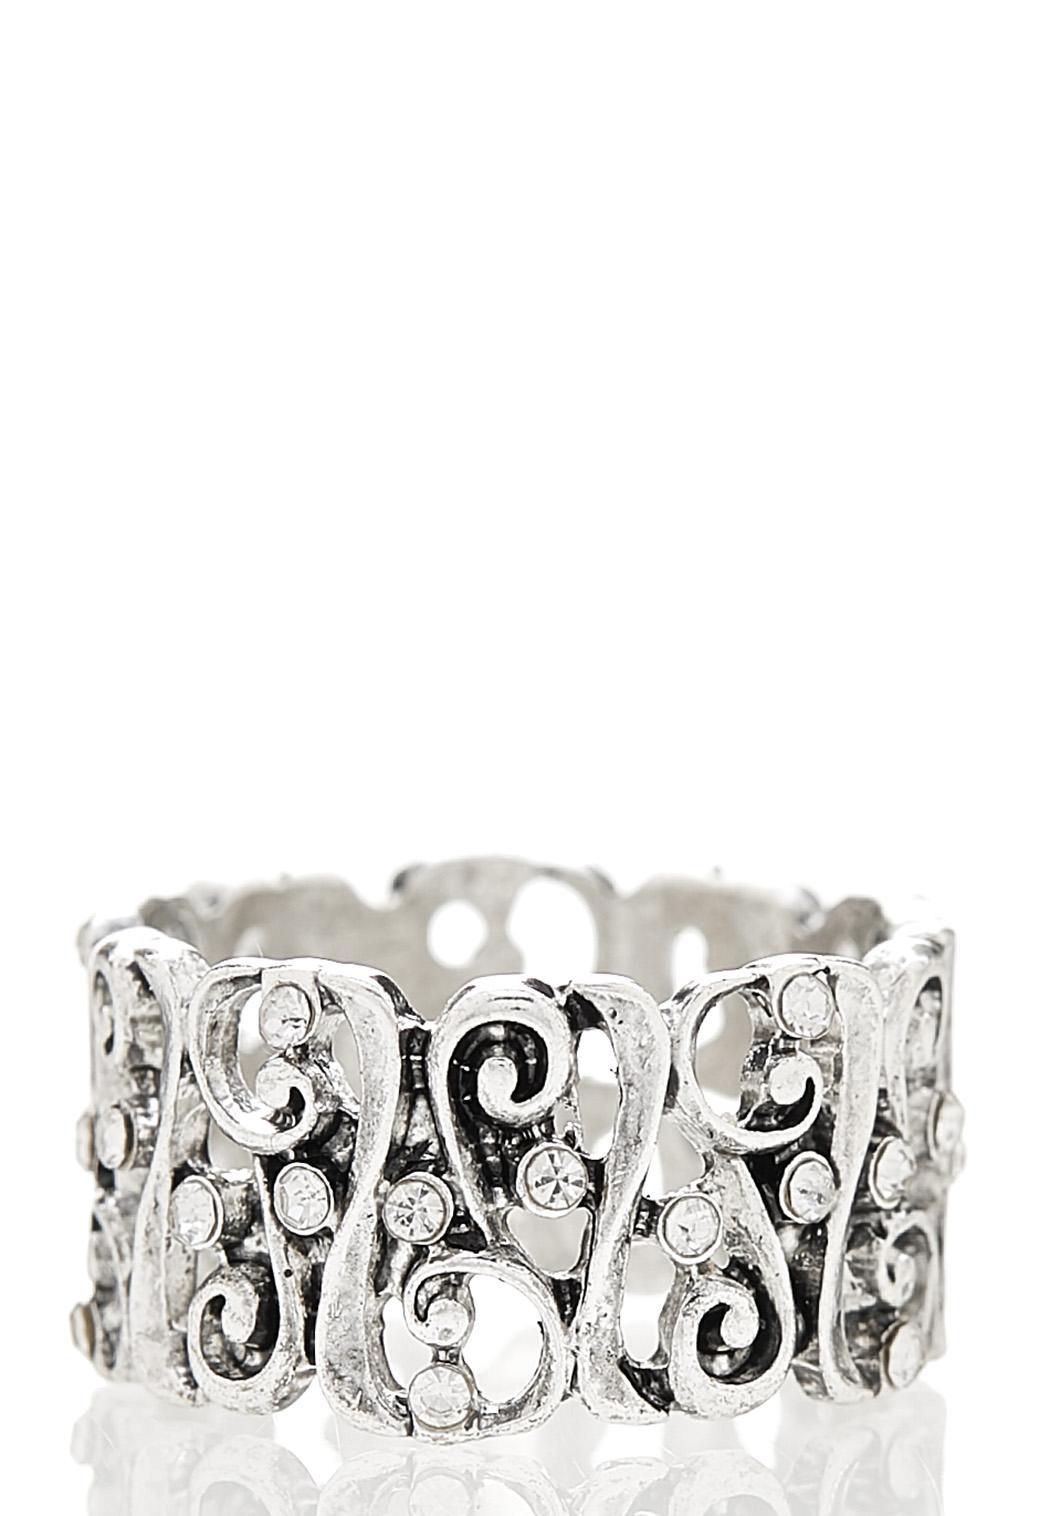 Antique Silver Filigree Ring